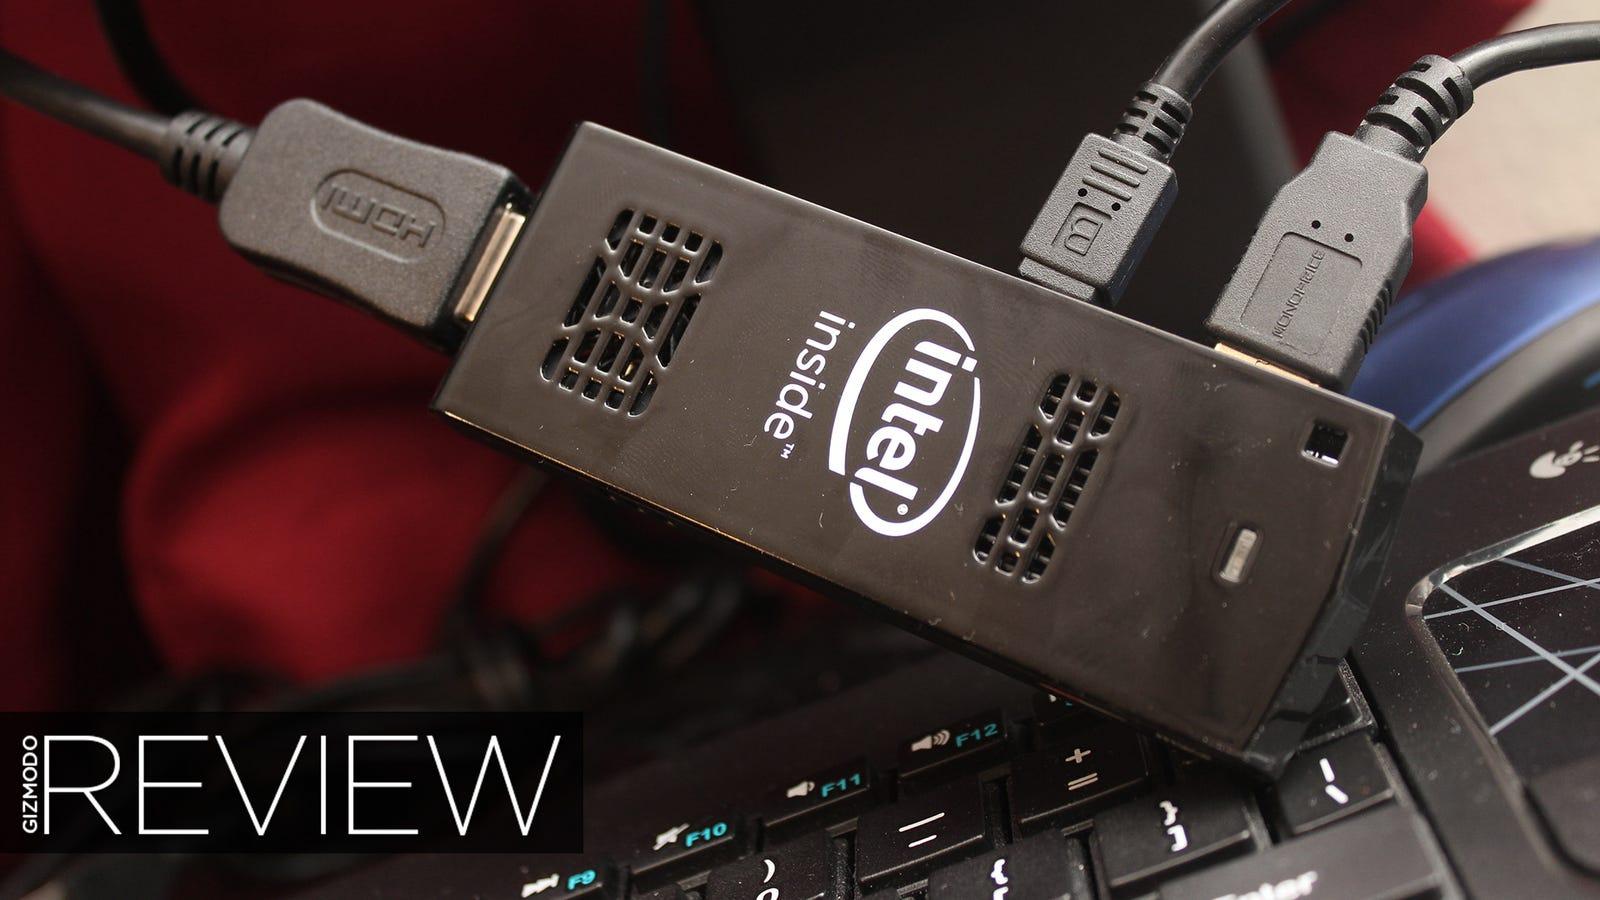 Intel Compute Stick Review: Don't Buy It